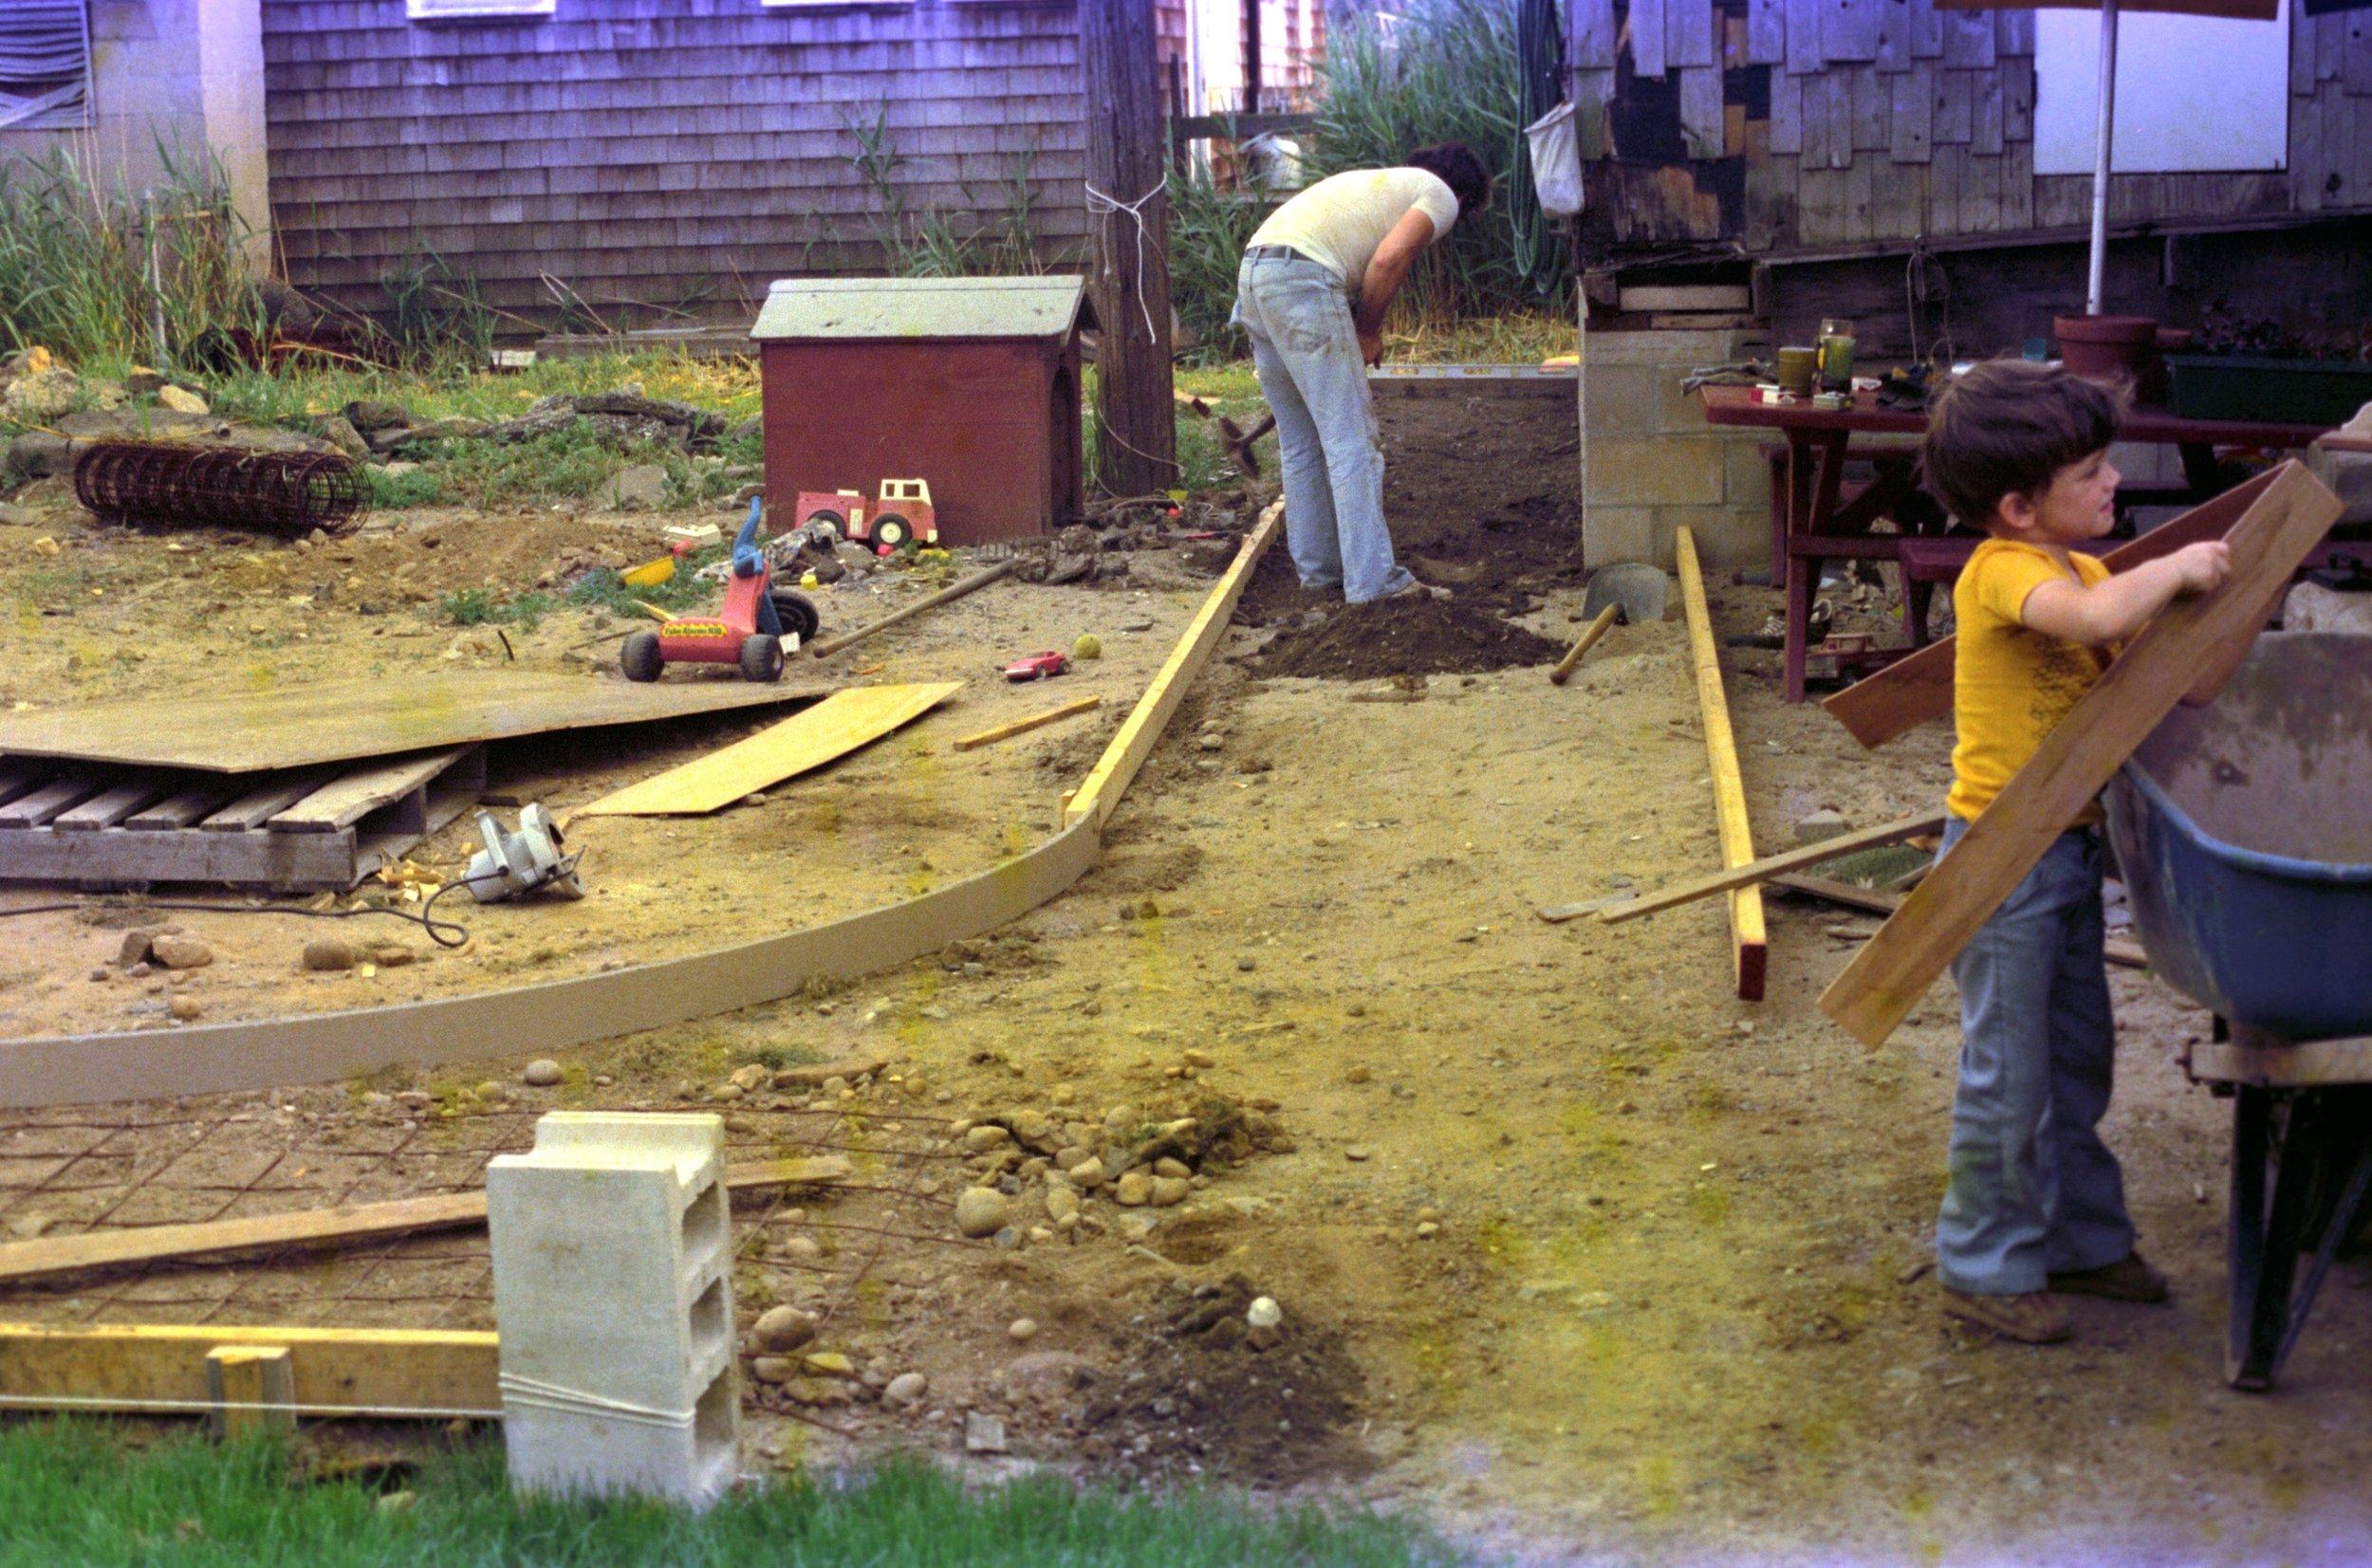 1978_Bird_Sanctuary_Tom_Laying_Cement_Helping_Tractor_Trucks_009.jpg